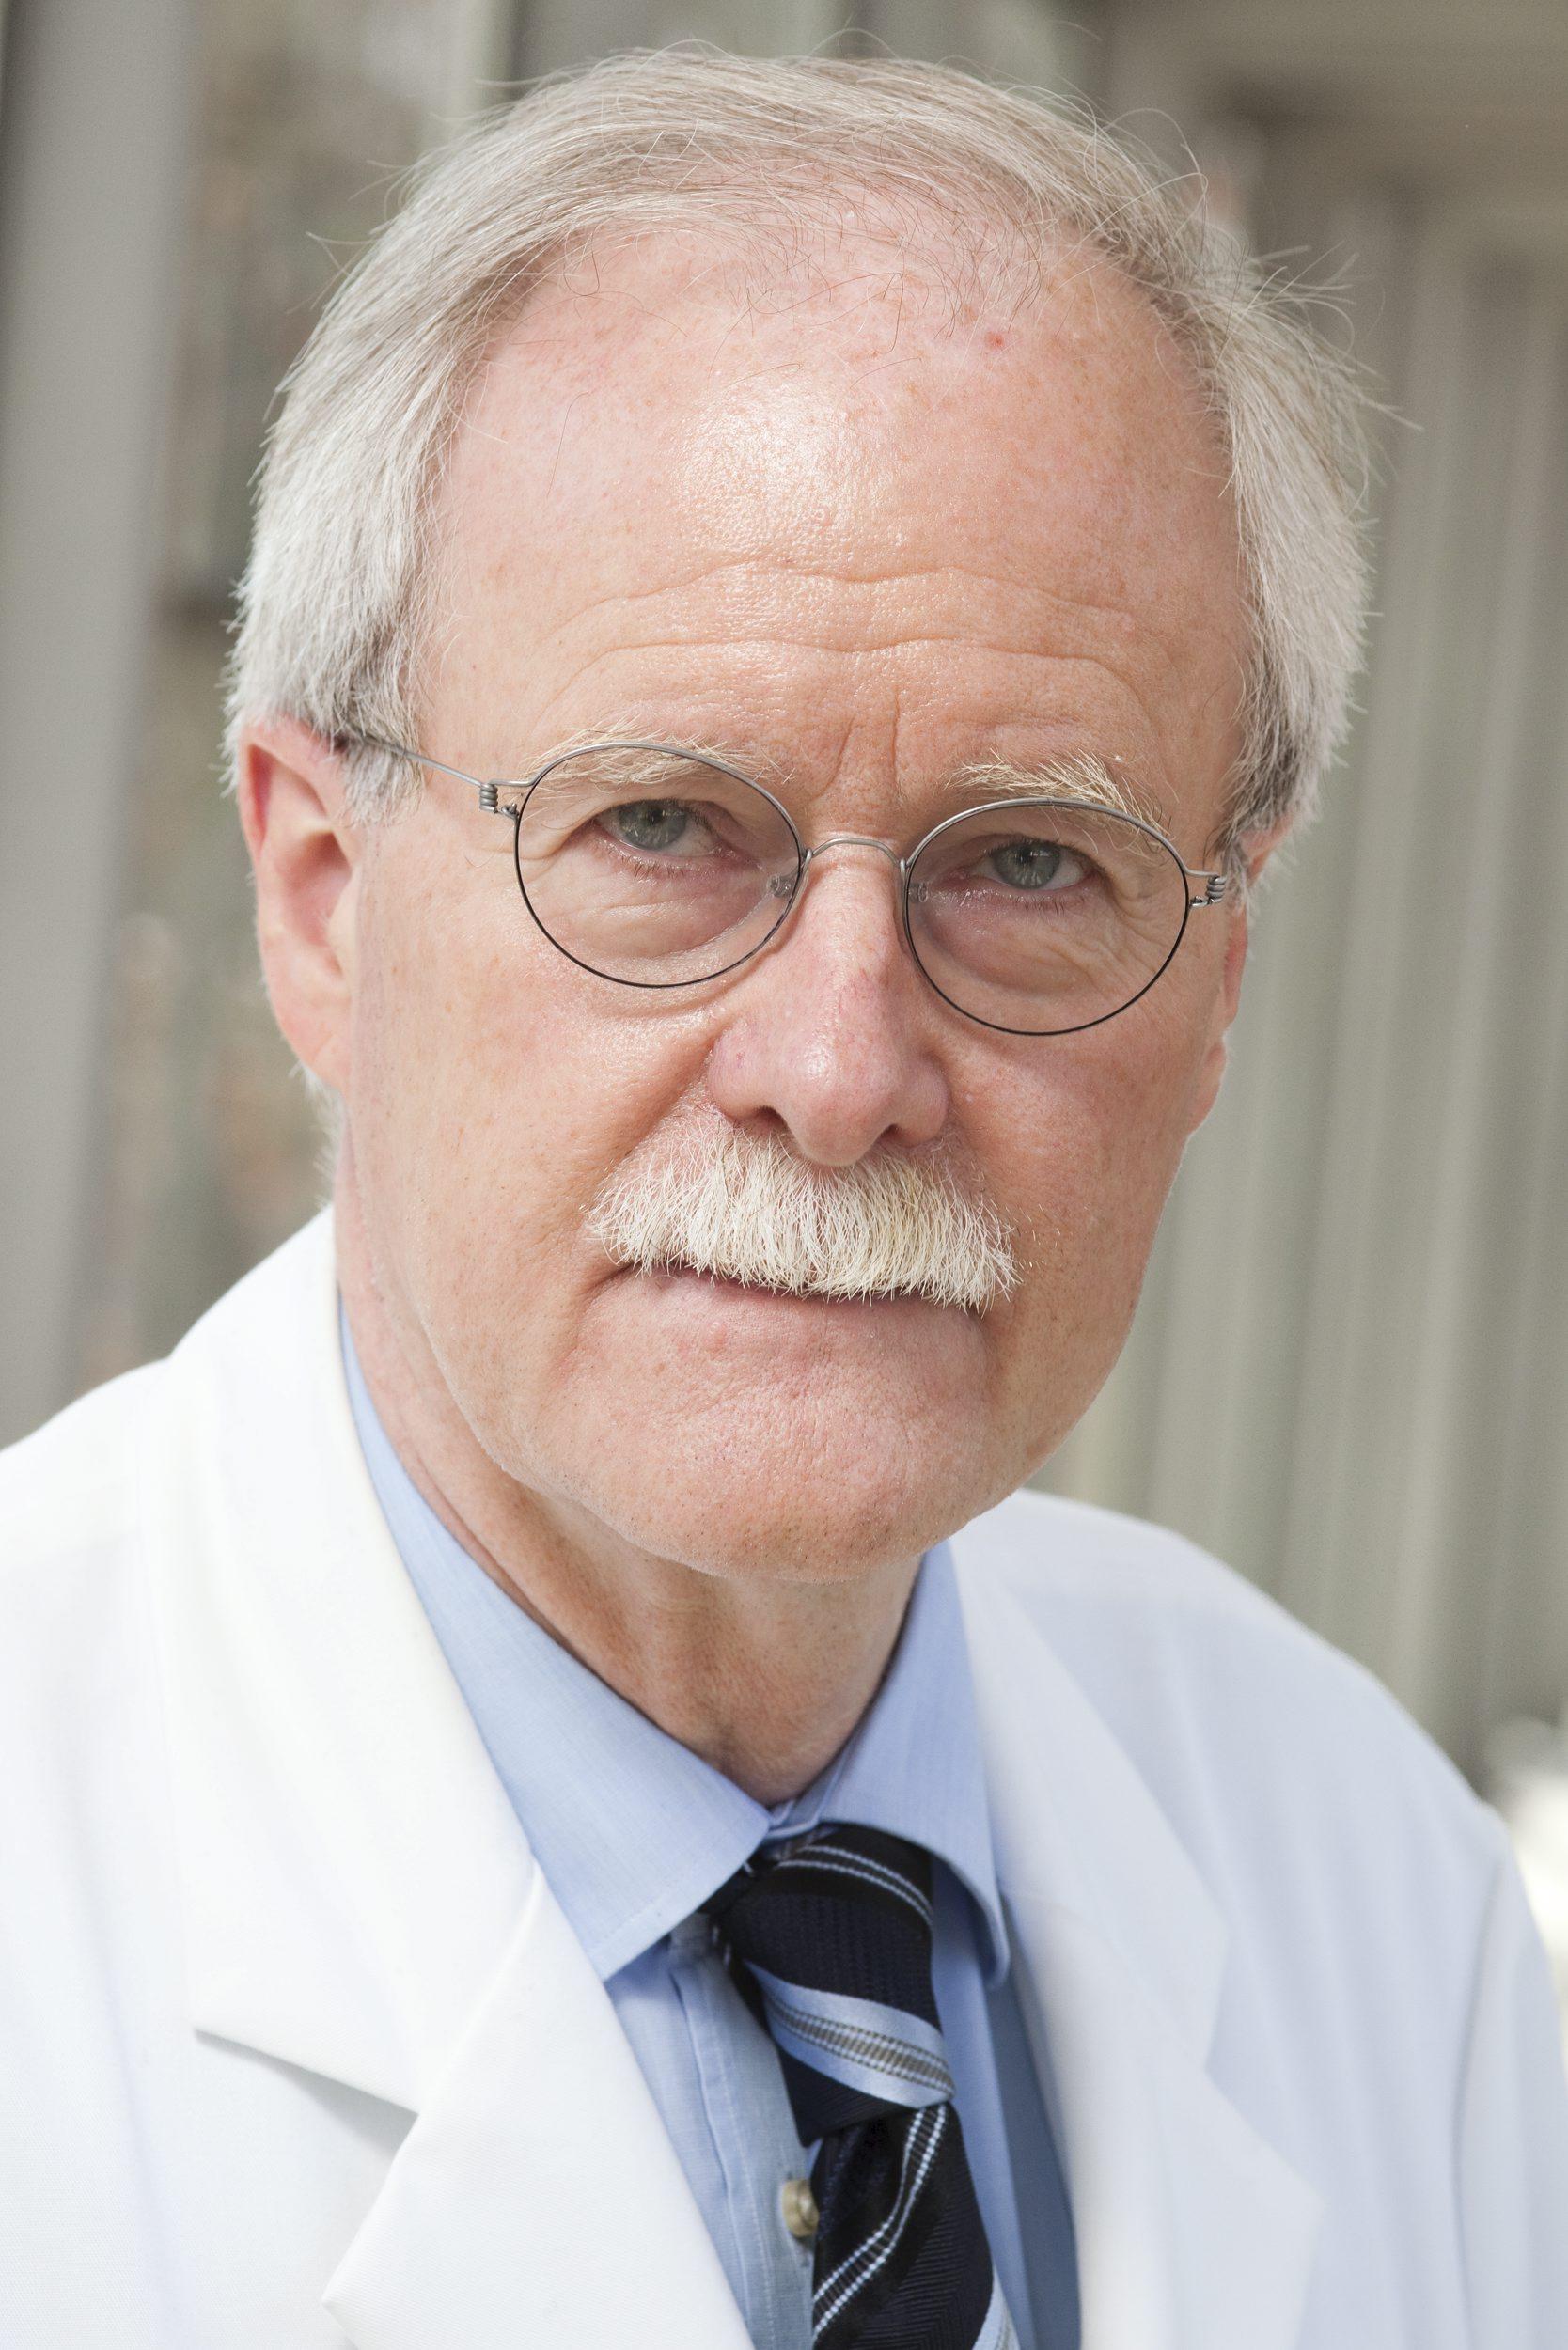 image of Wolfgang Koenig